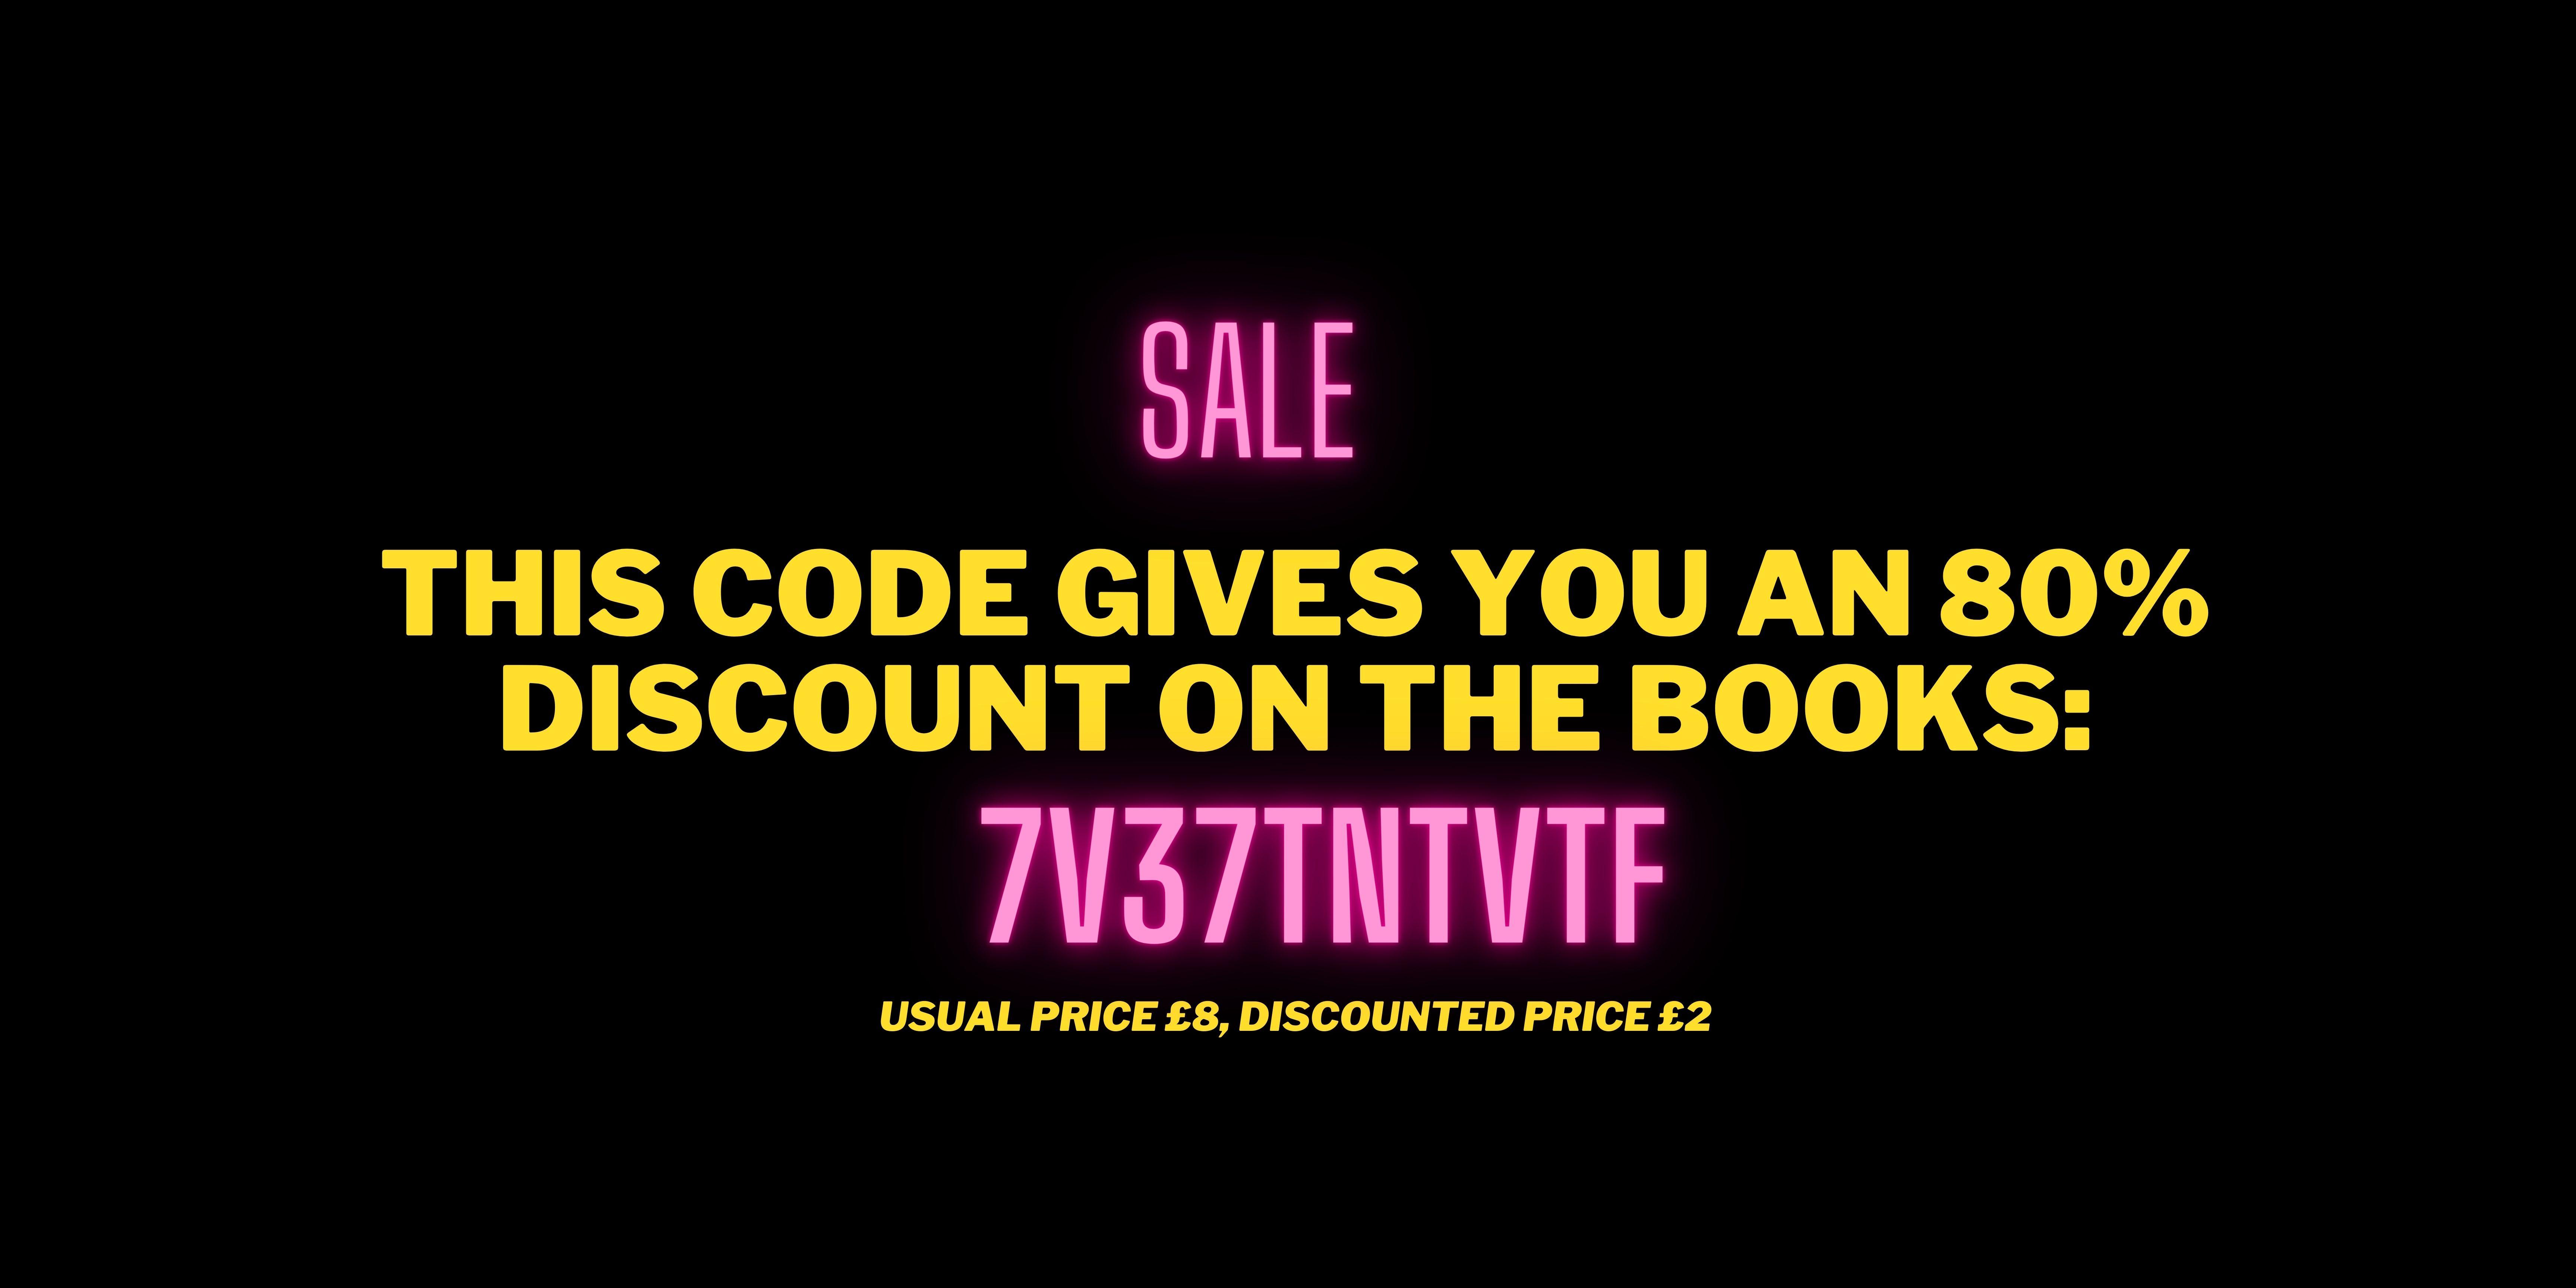 https://campaign-image.eu/zohocampaigns/72035000000241012_zc_v310_1629743776022_discount_banner___7v37tntvtf.jpg